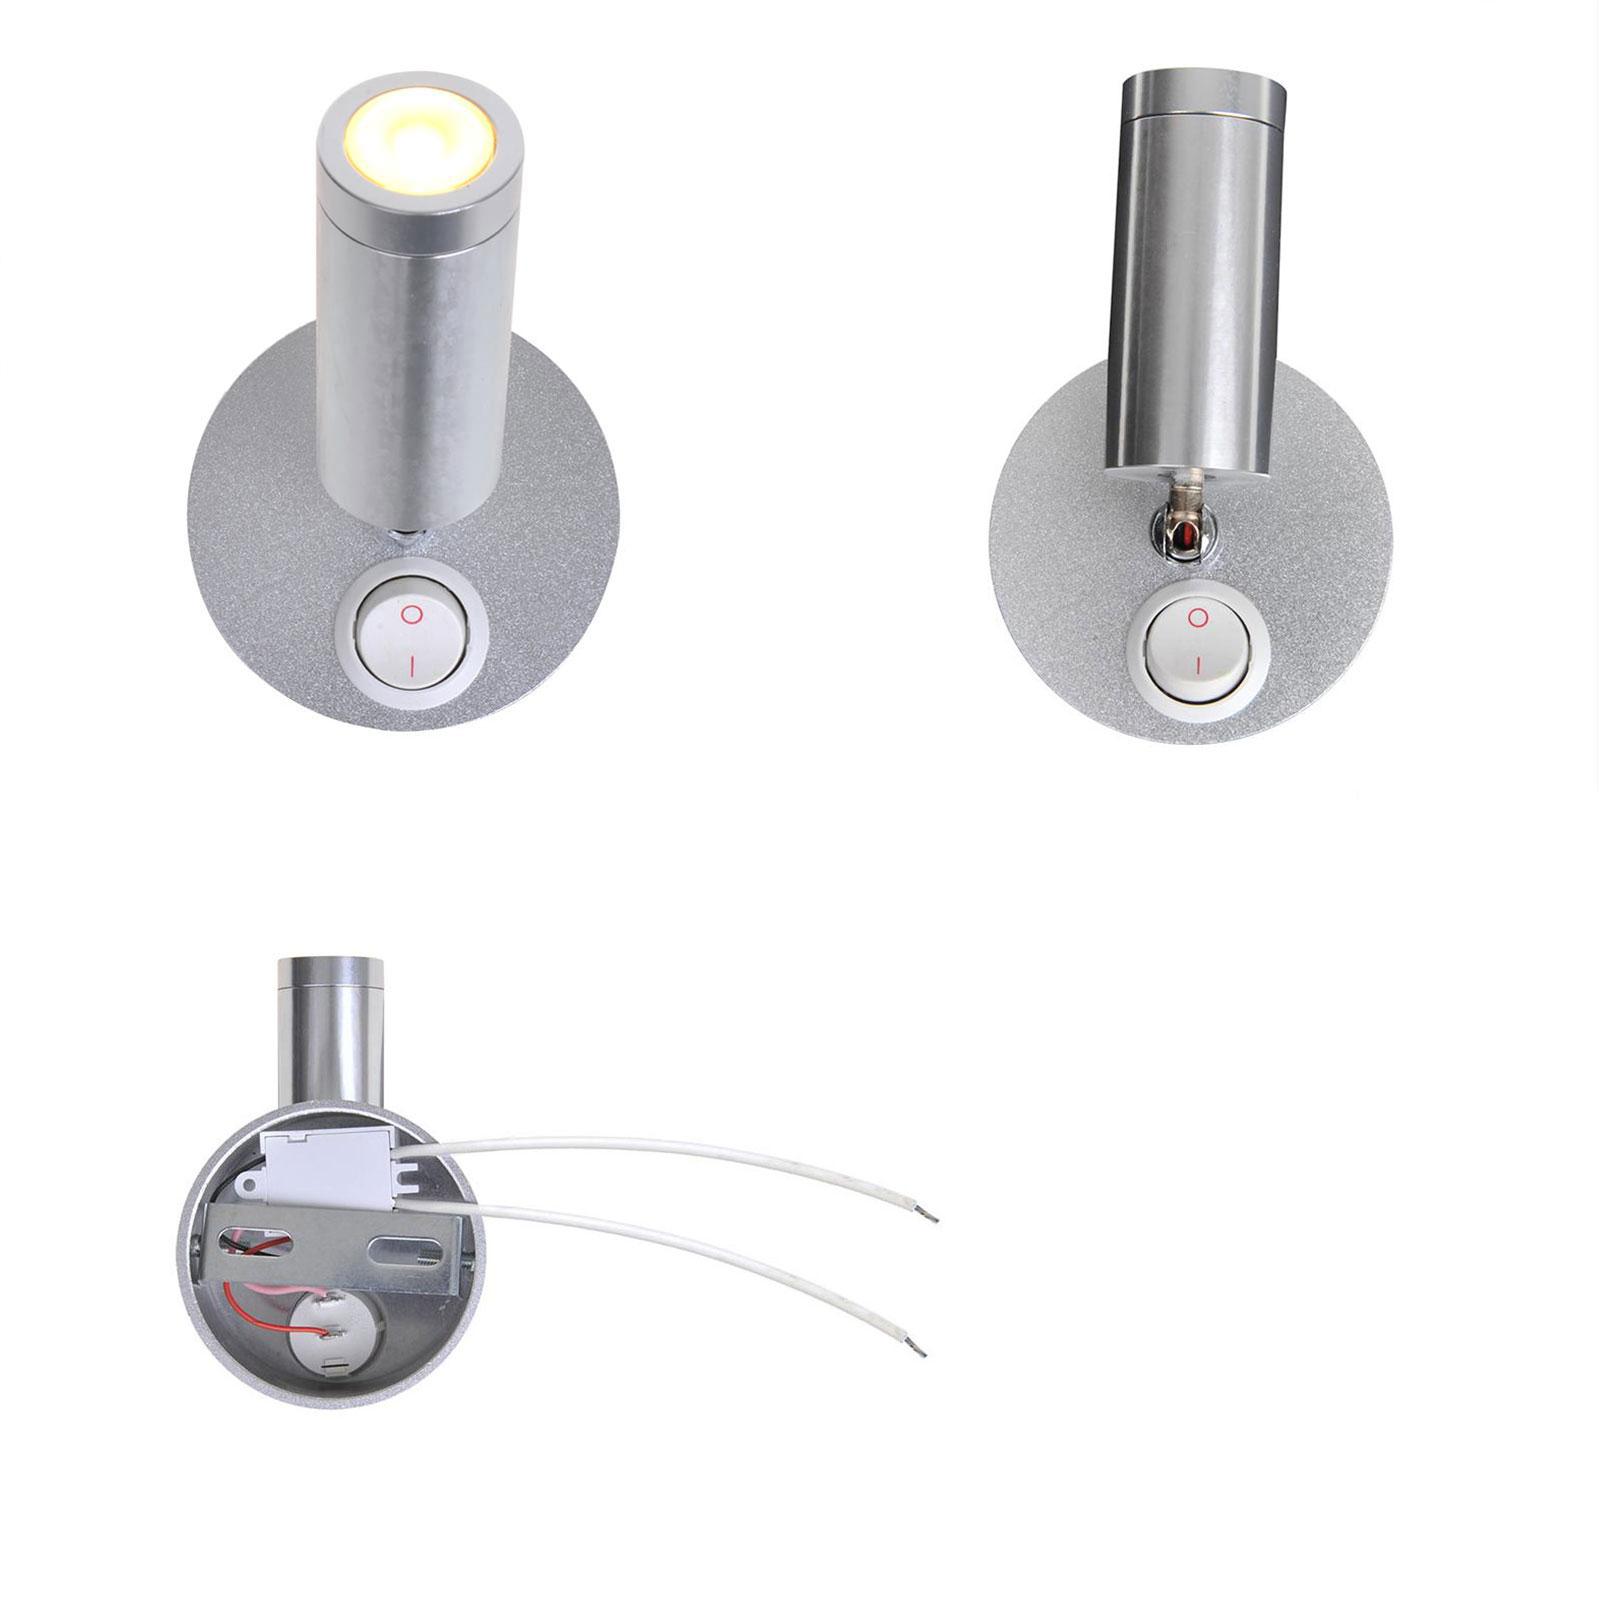 Aufbauspot 1 LED schwenkbar 12v, 120lm, Ø65x65-130mm